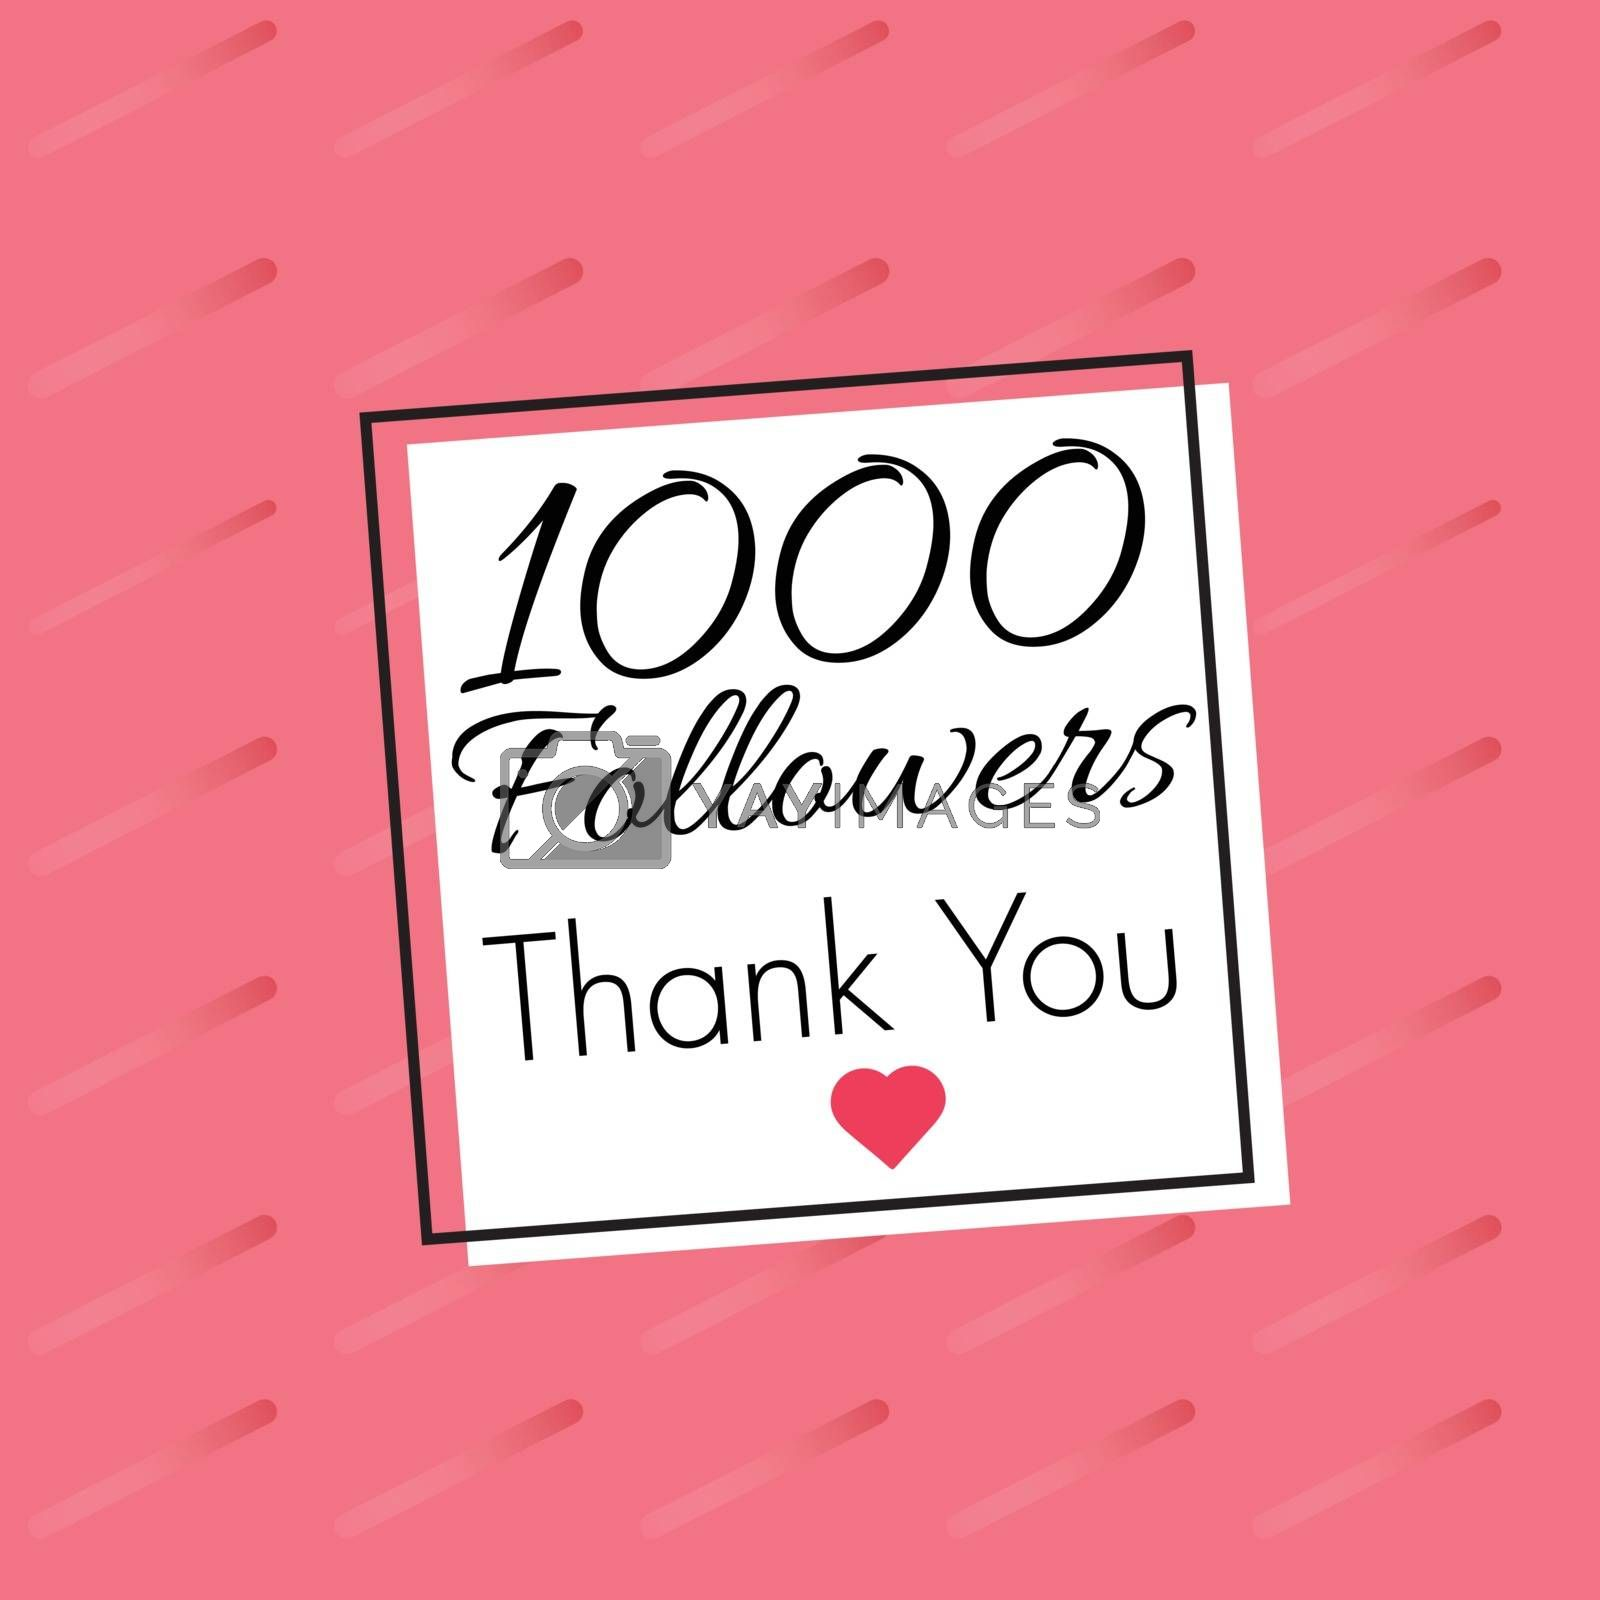 Thank you for 1000 followers congratulation card design.